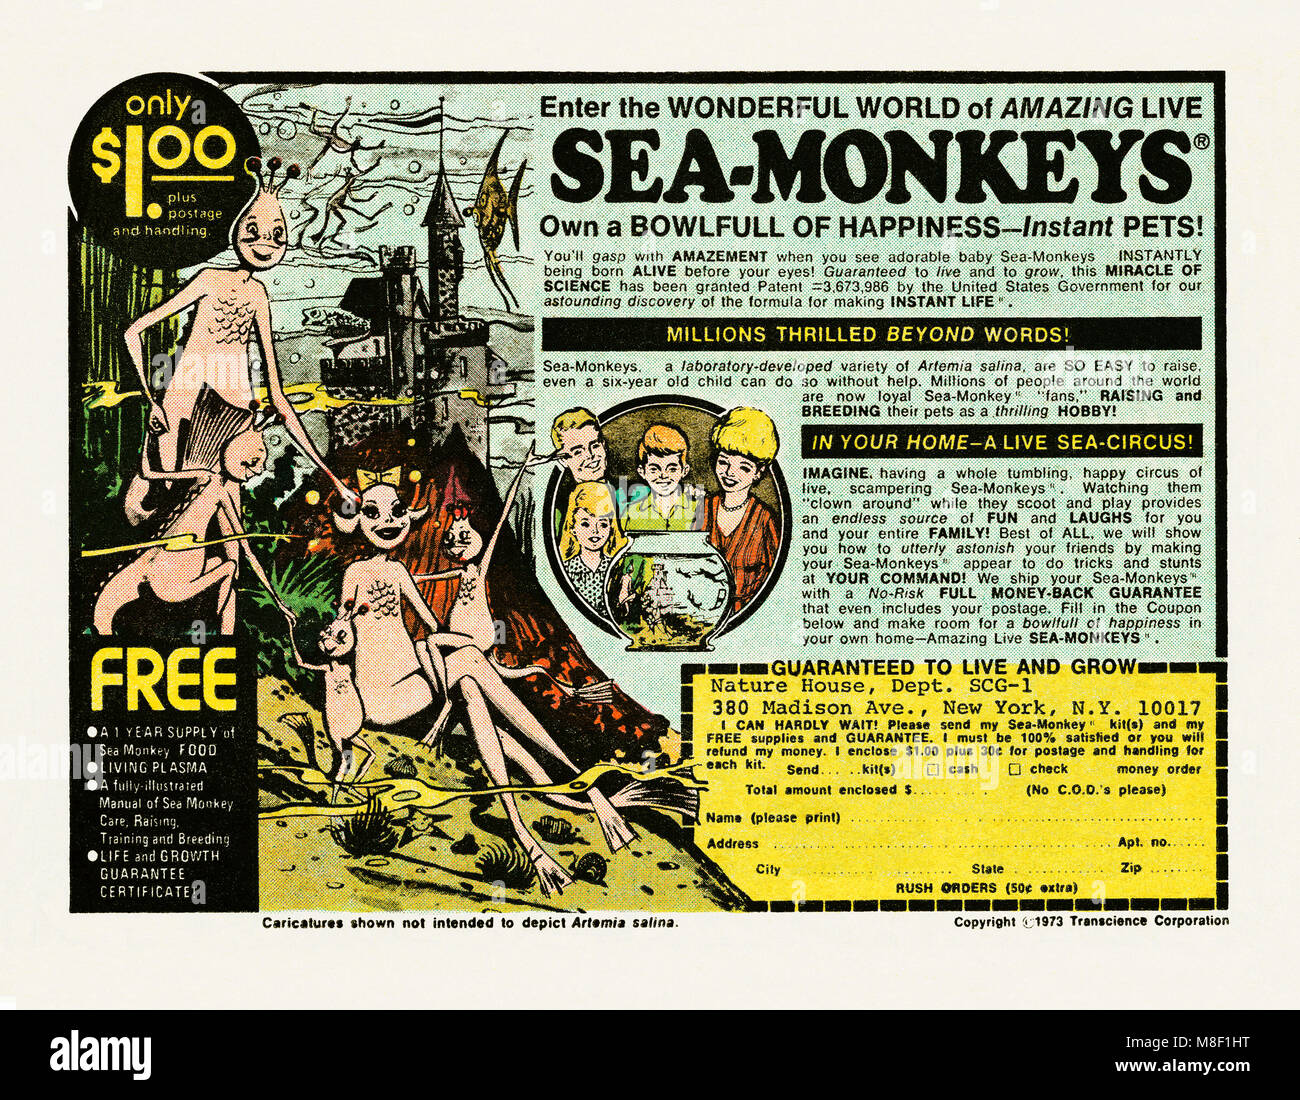 Pet Monkey Imágenes De Stock & Pet Monkey Fotos De Stock - Alamy